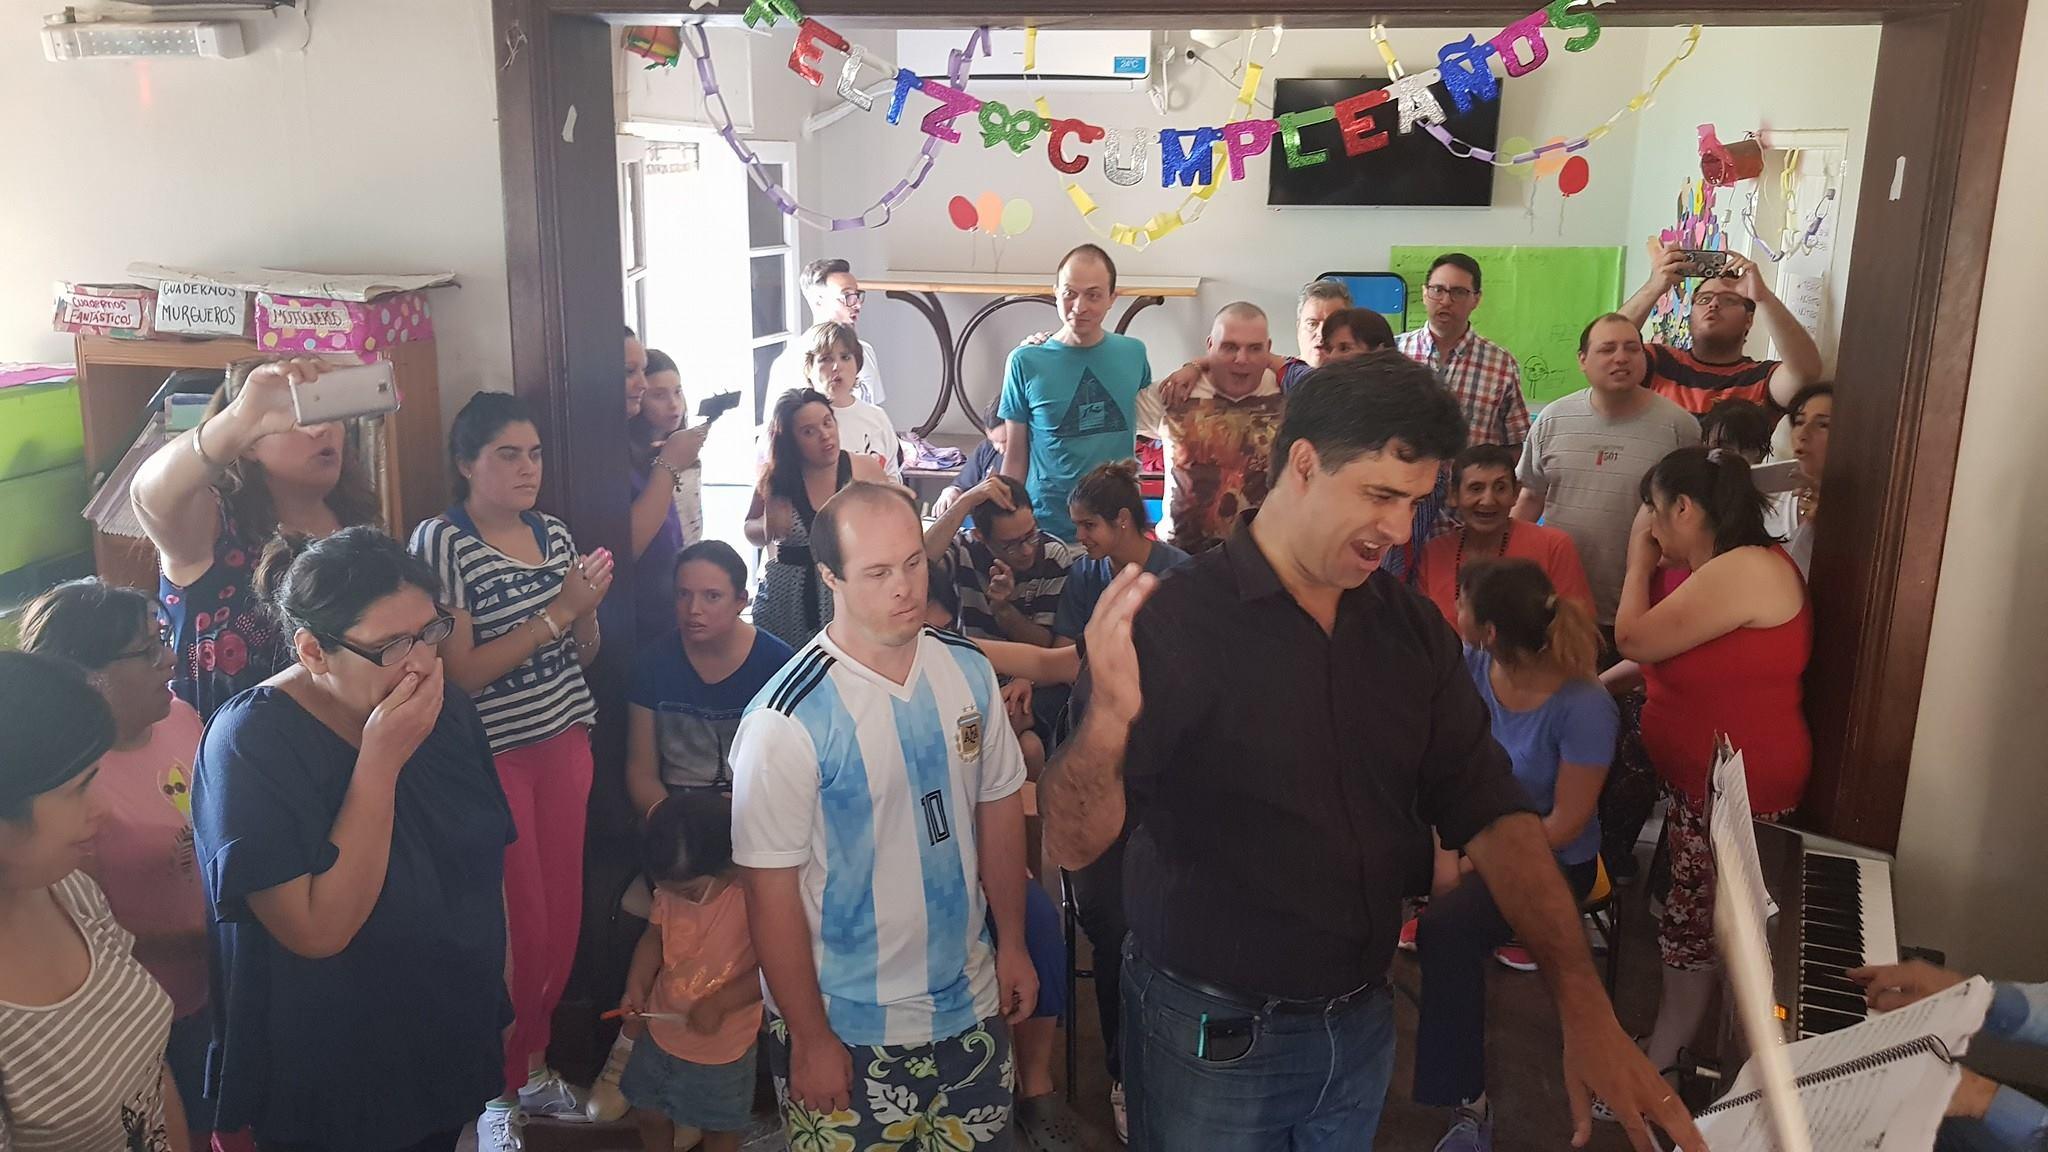 centro-de-dia-antares-nov-2017-cordoba-5